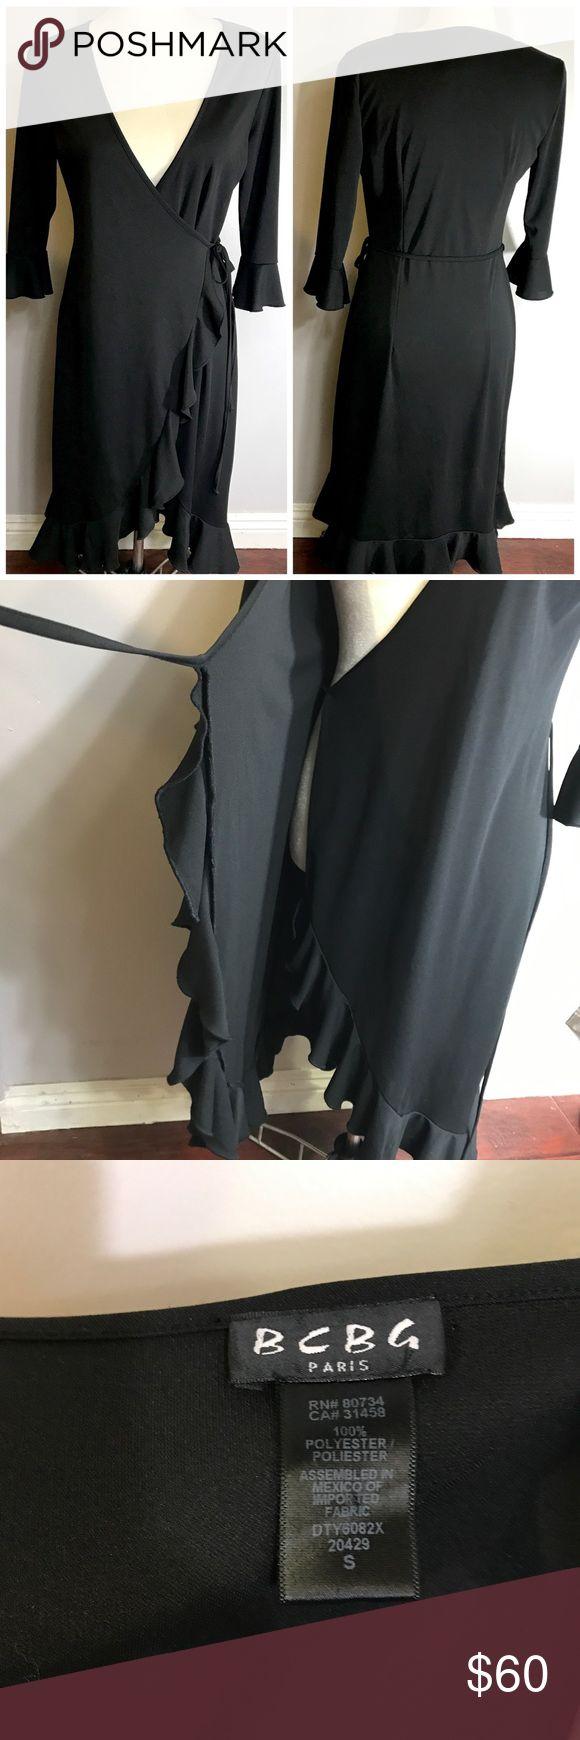 Bcbg Paris Black Wrap dress This dress is so pretty! It has half Bell sleeves. Ruffle trim. Bcbg Paris Dresses